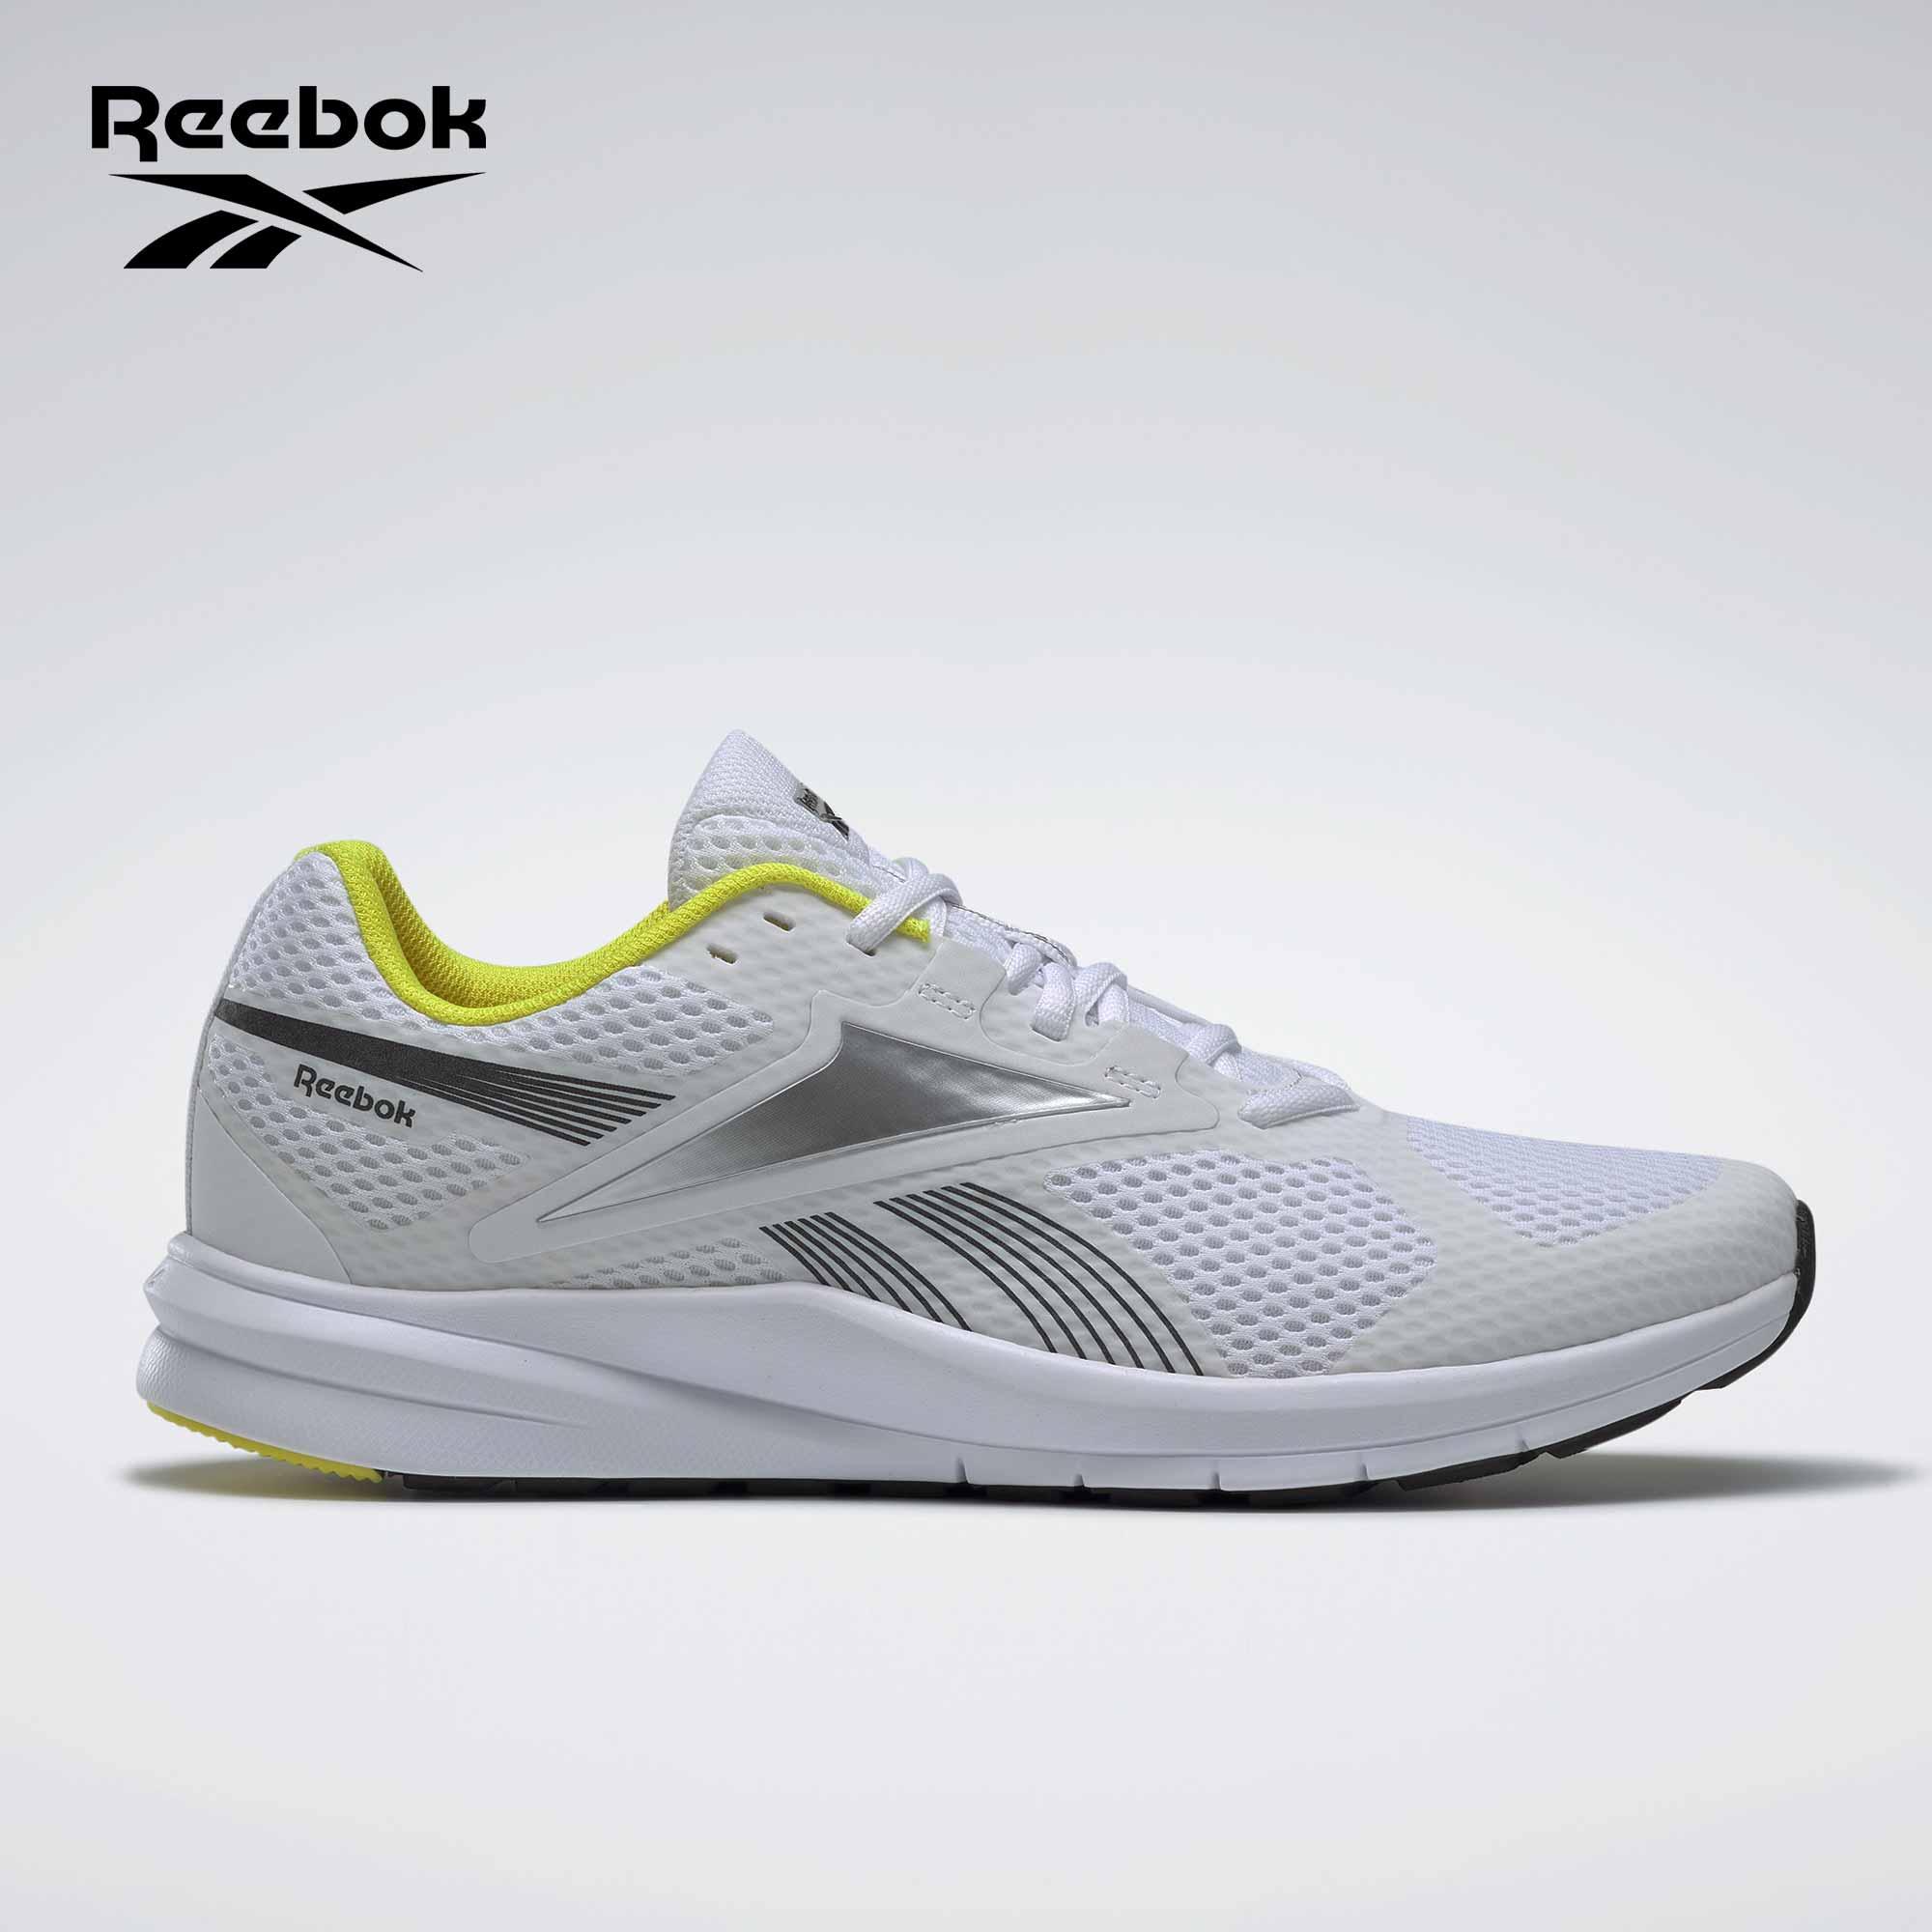 Reebok Endless Road 2.0 Running Shoes